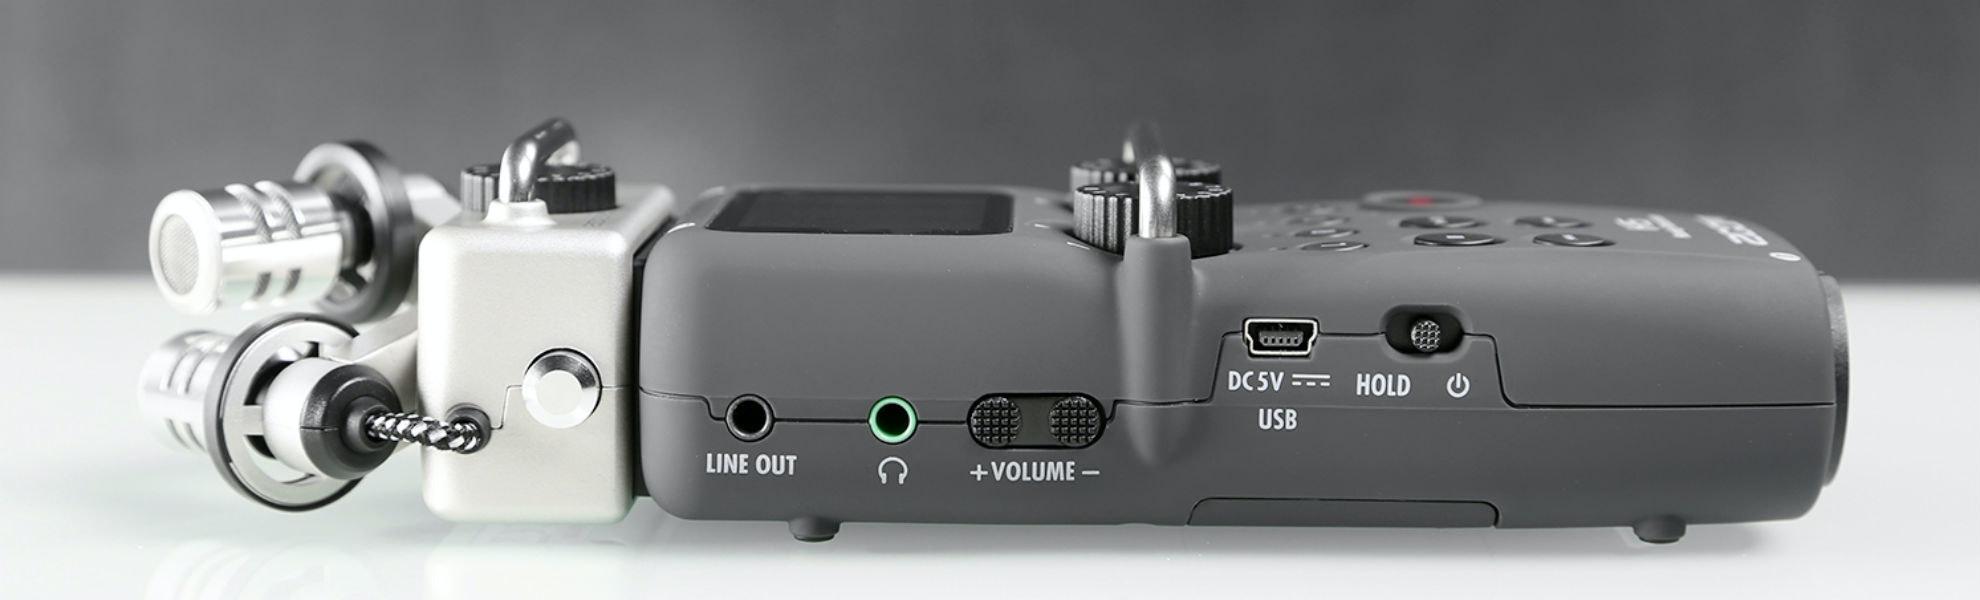 Zoom H5 Portable Recorder